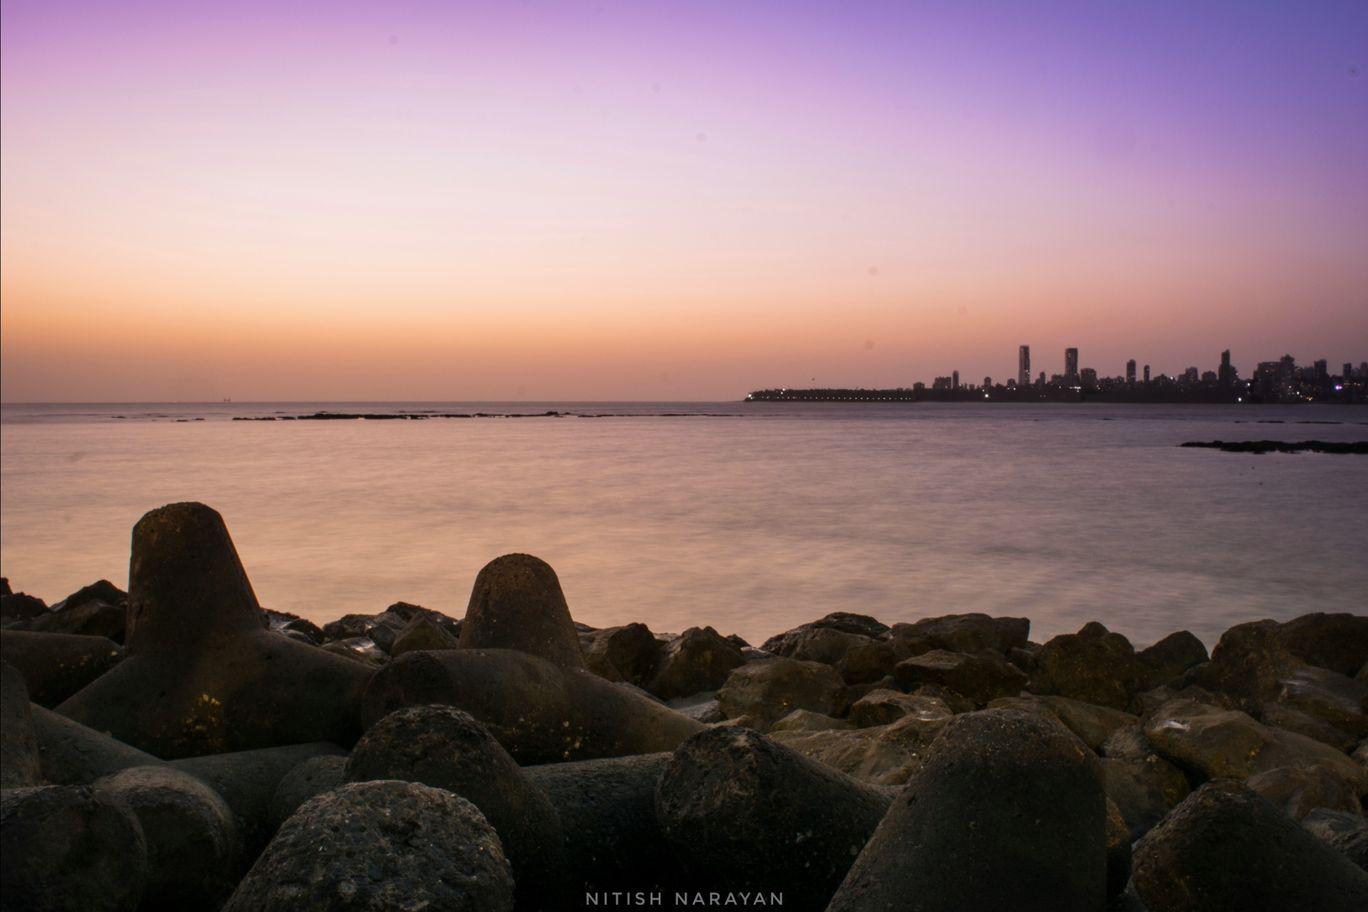 Photo of Marine Lines By Nitish Narayan